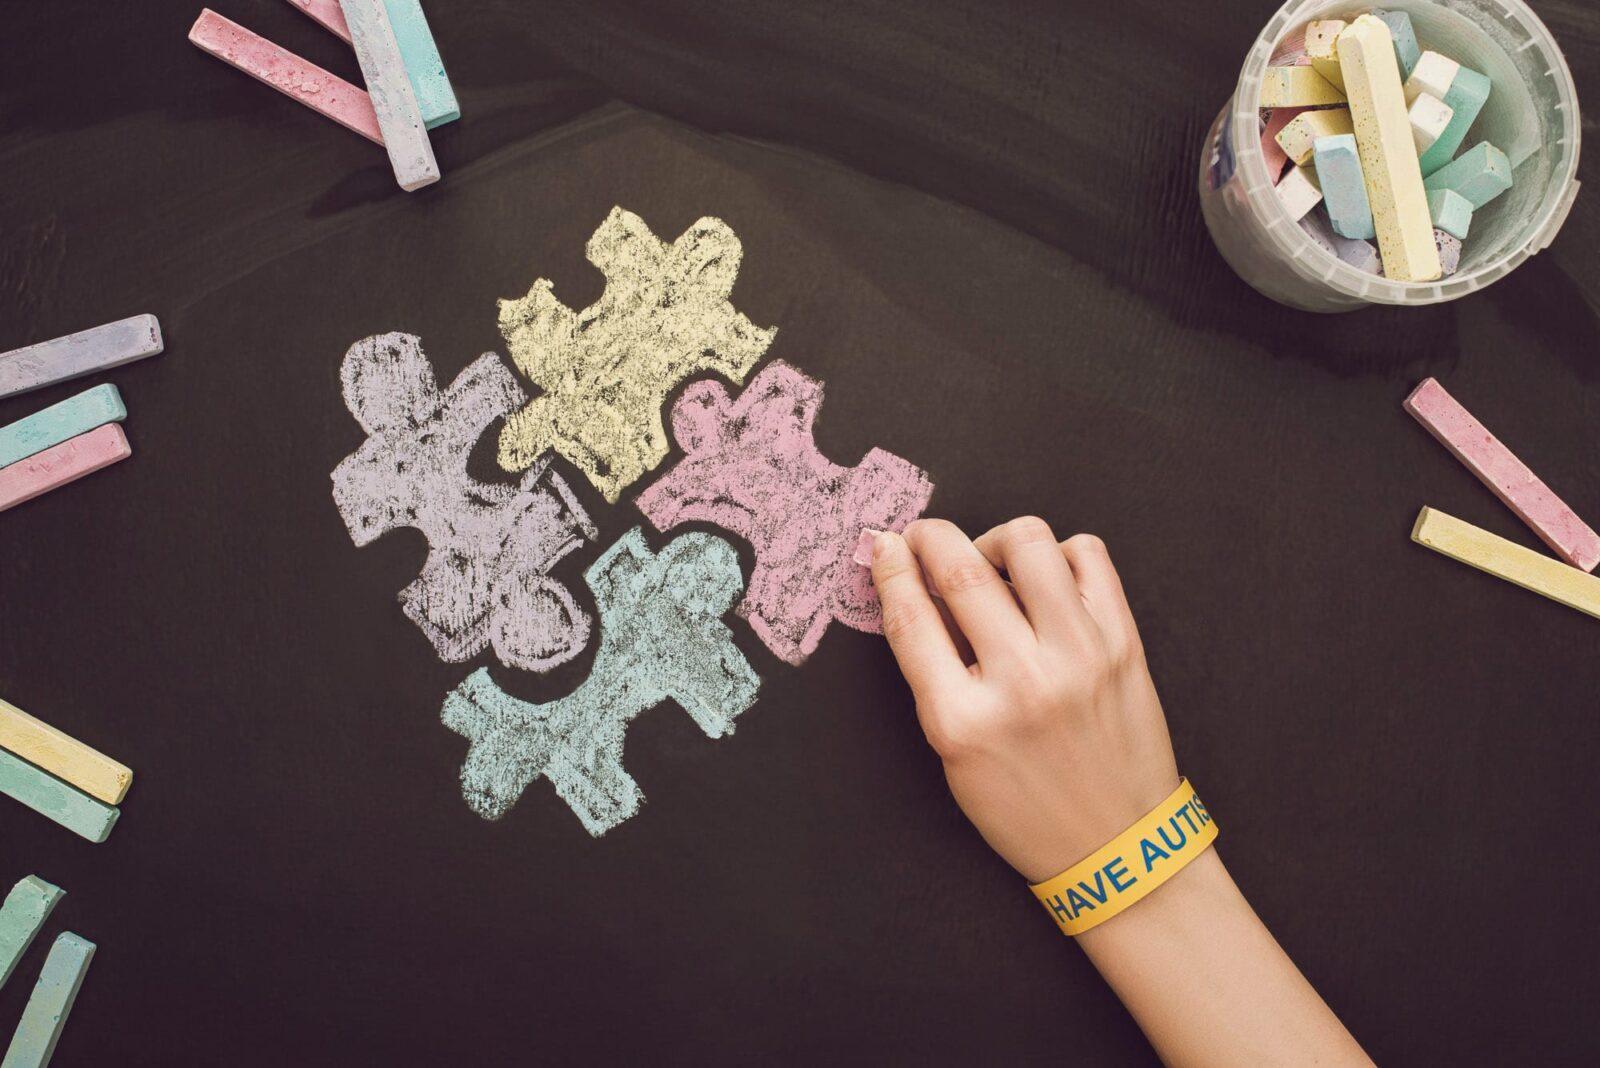 Autism jigsaw pieces